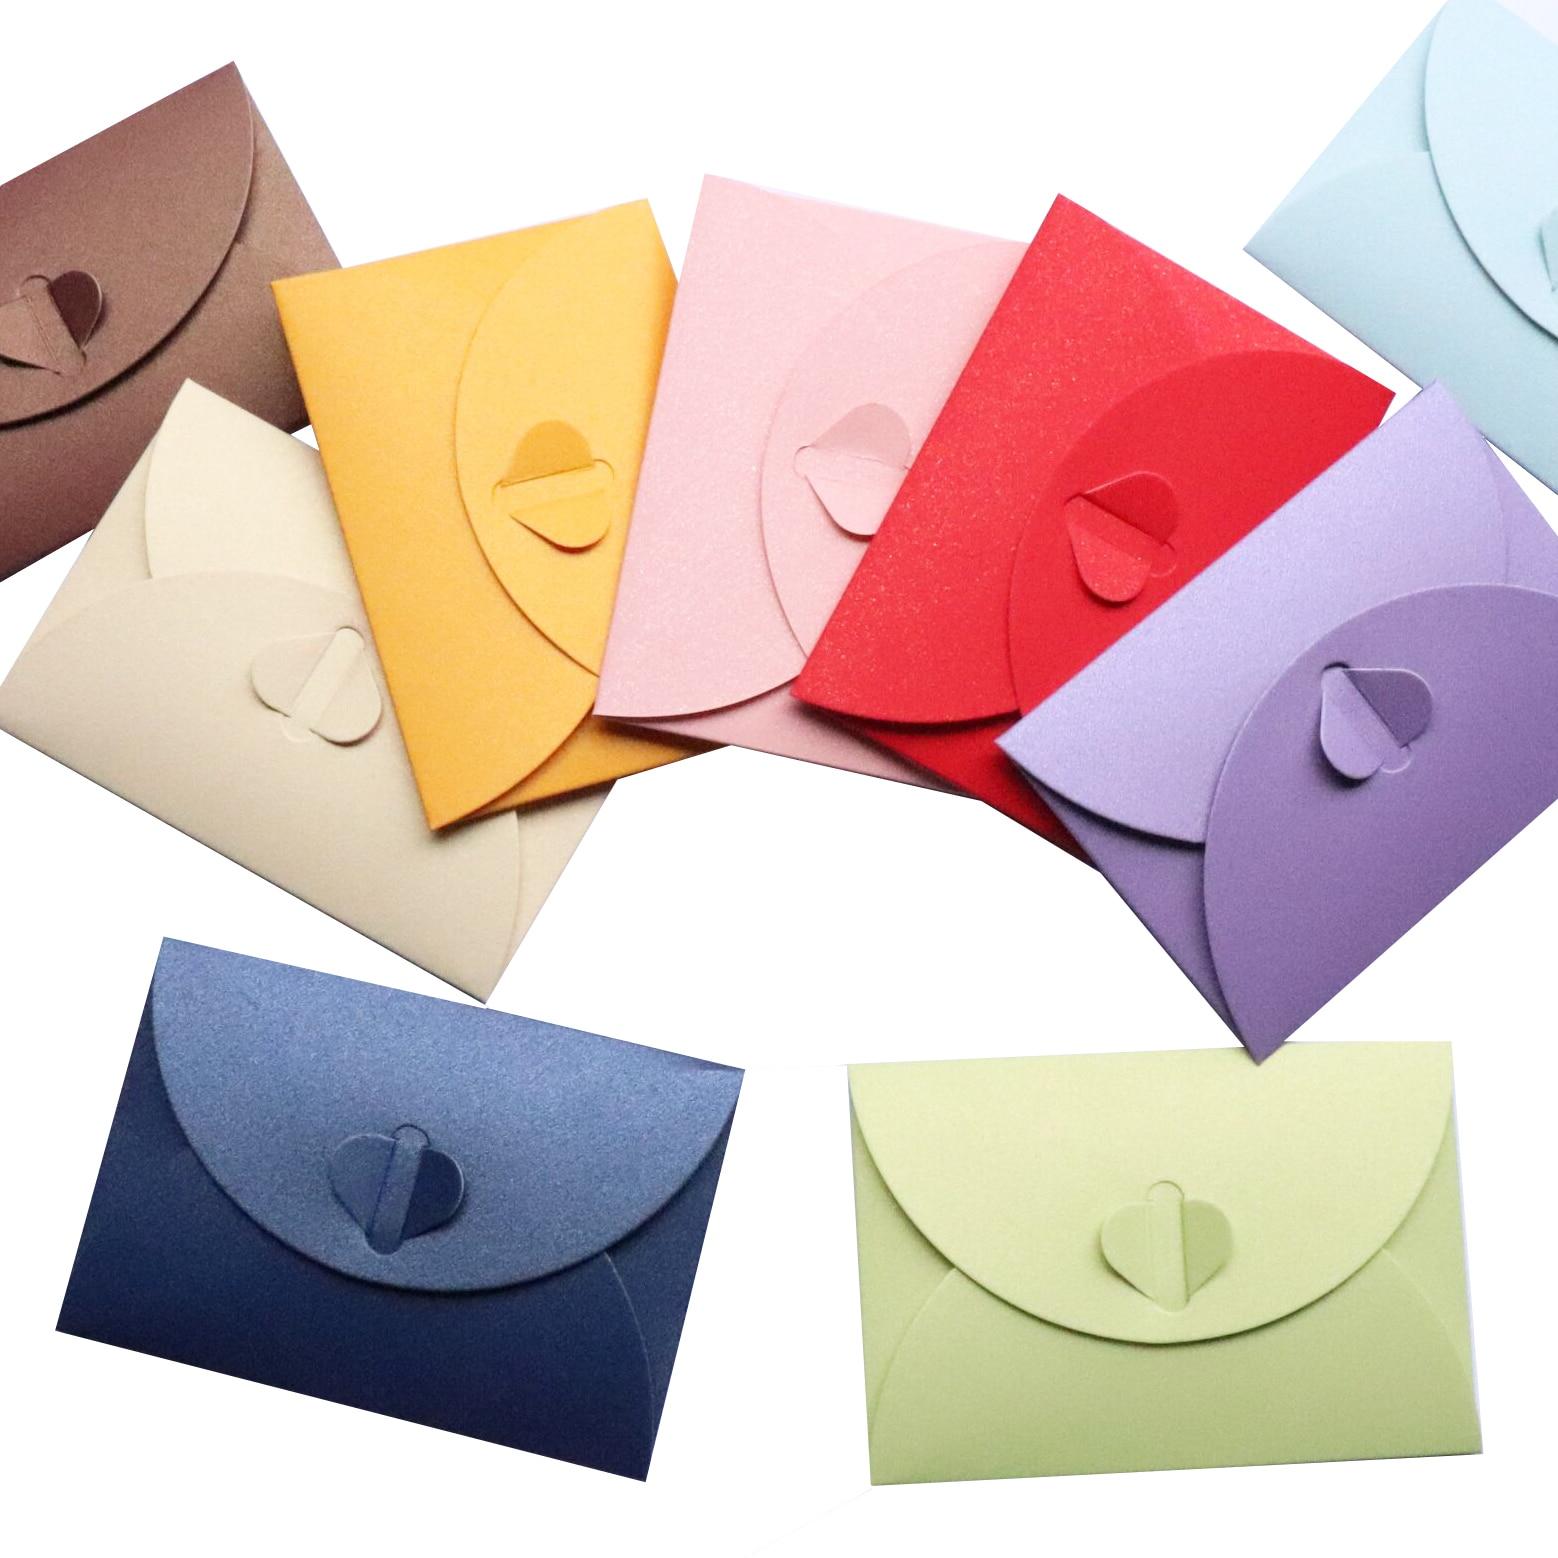 (10 Pieces/lot) 15.5*10.5cm Colorful Vintage Envelope Pearl Paper Envelopes Gift Greeting Card Invitation Card Letter Envelopes